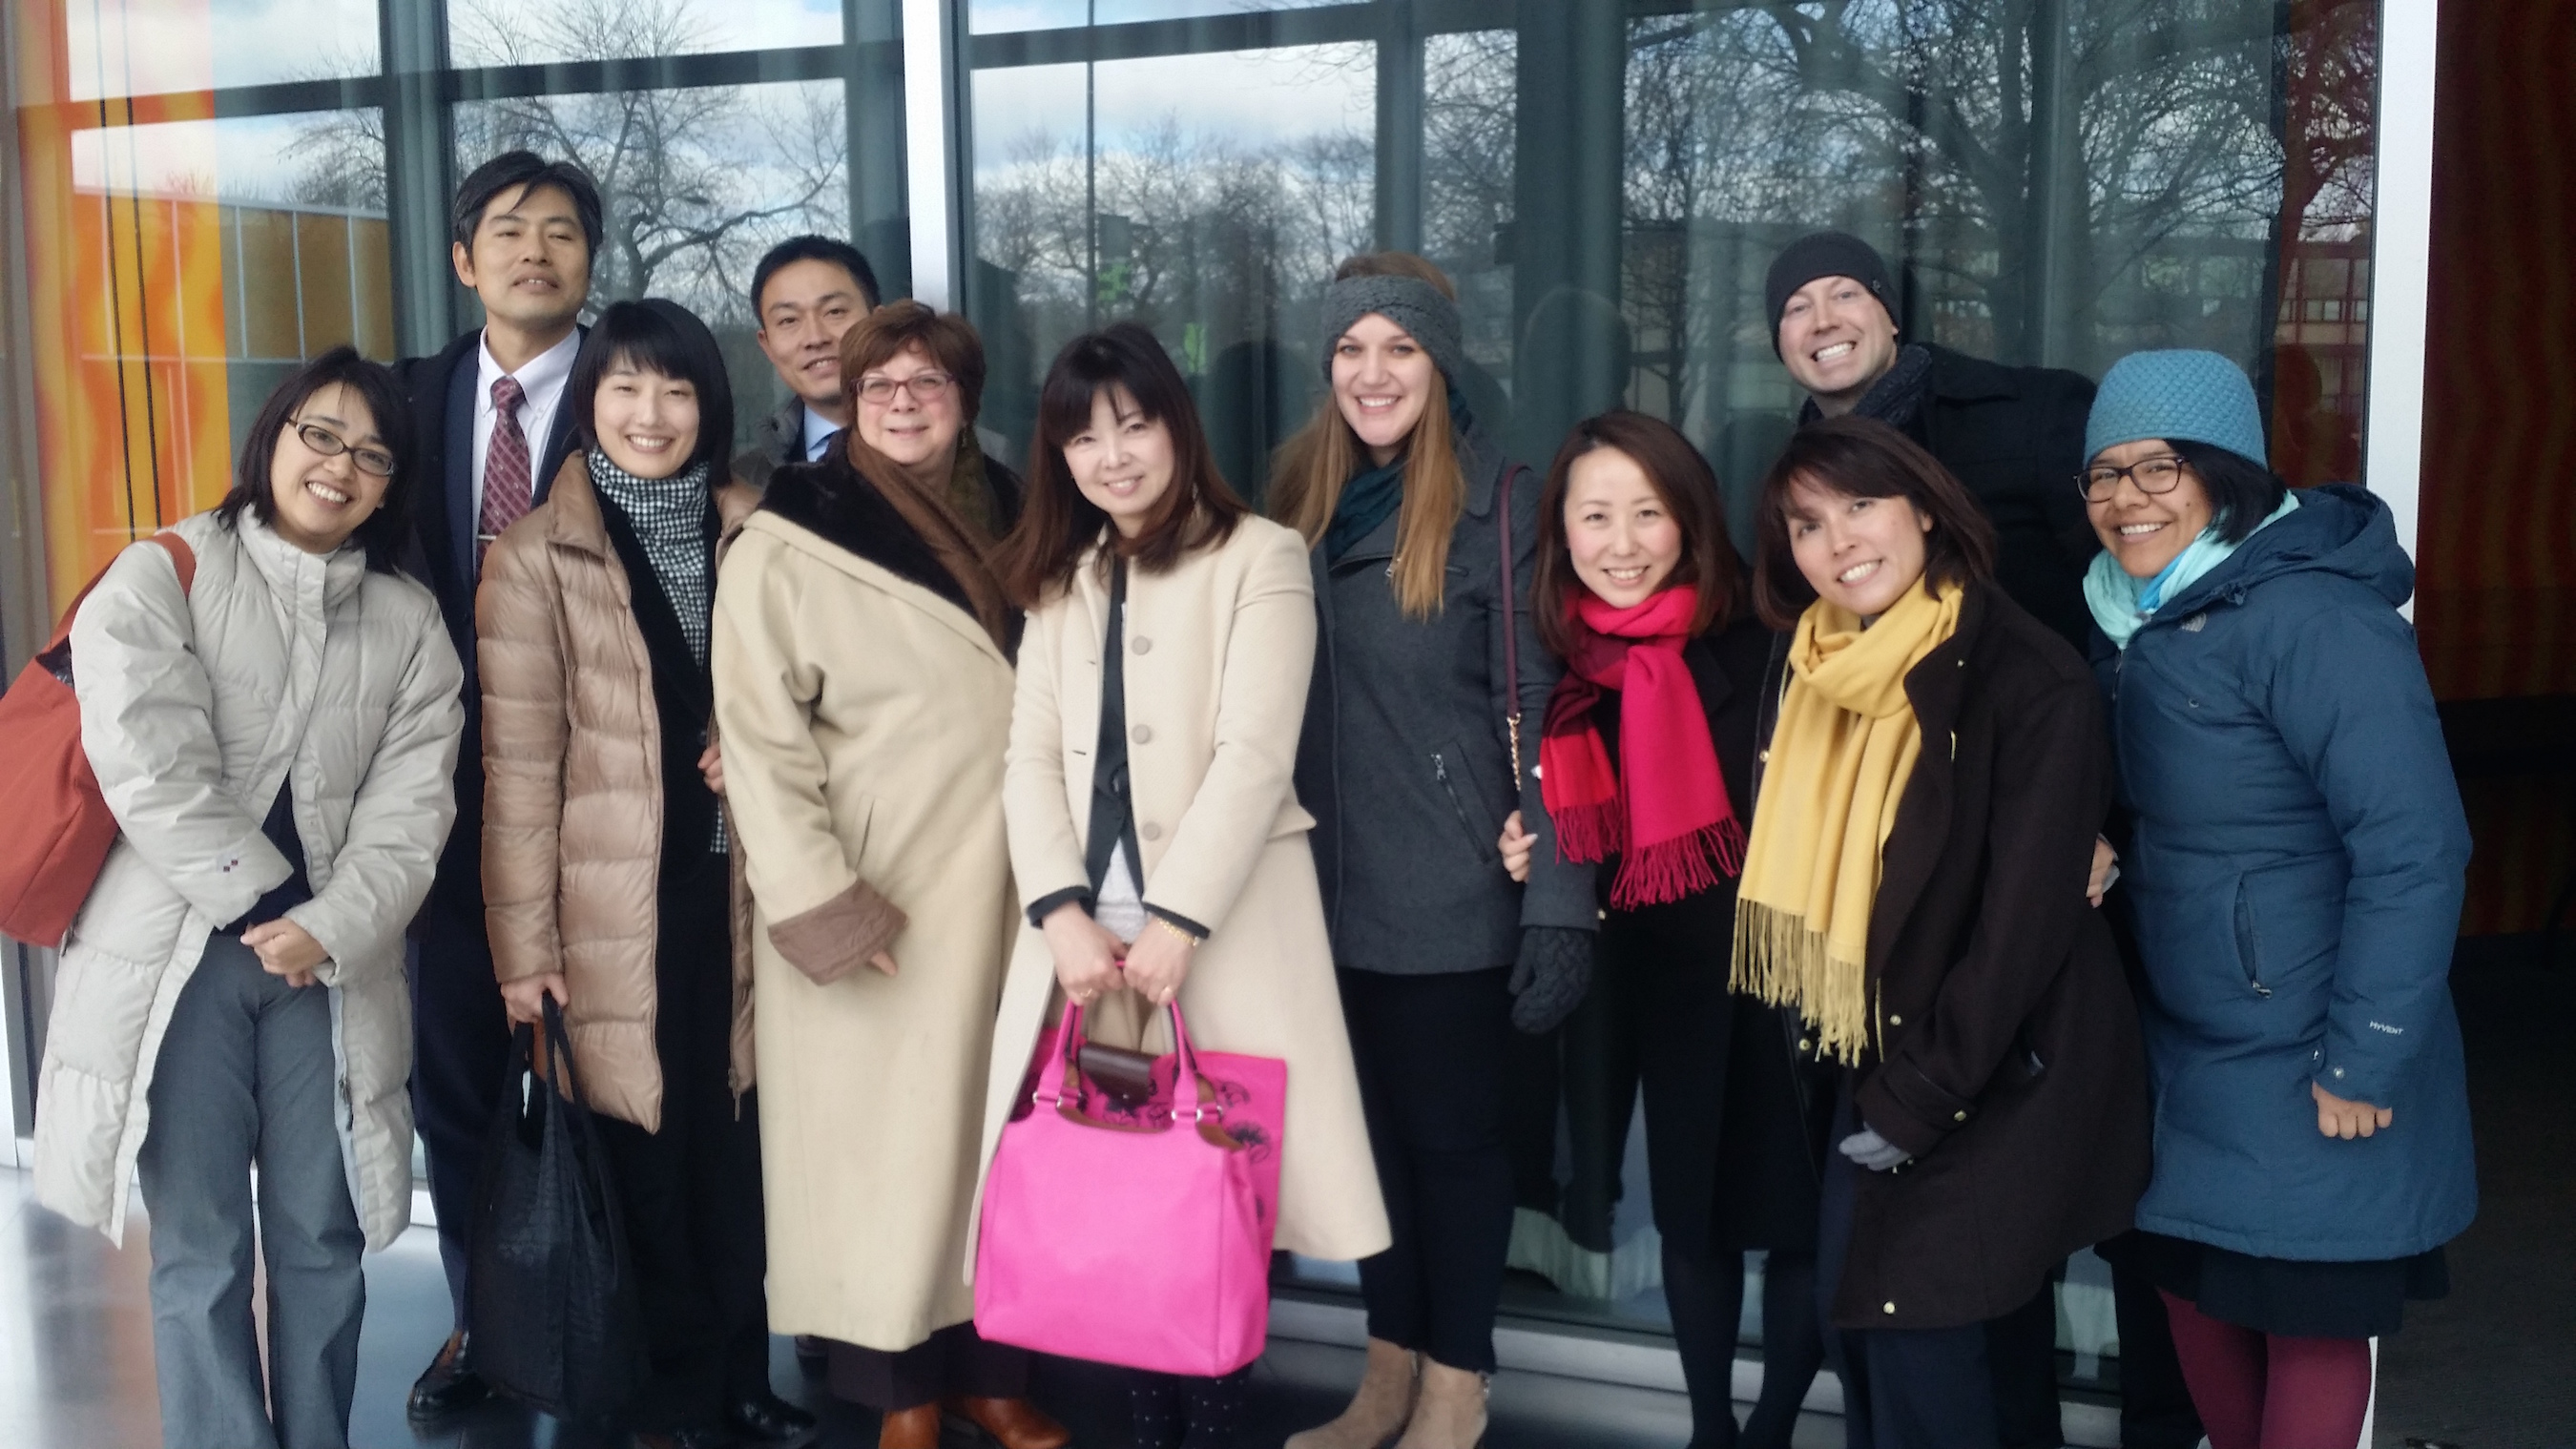 SASDI hosts Fall Visitors to Main Campus from WorldChicago